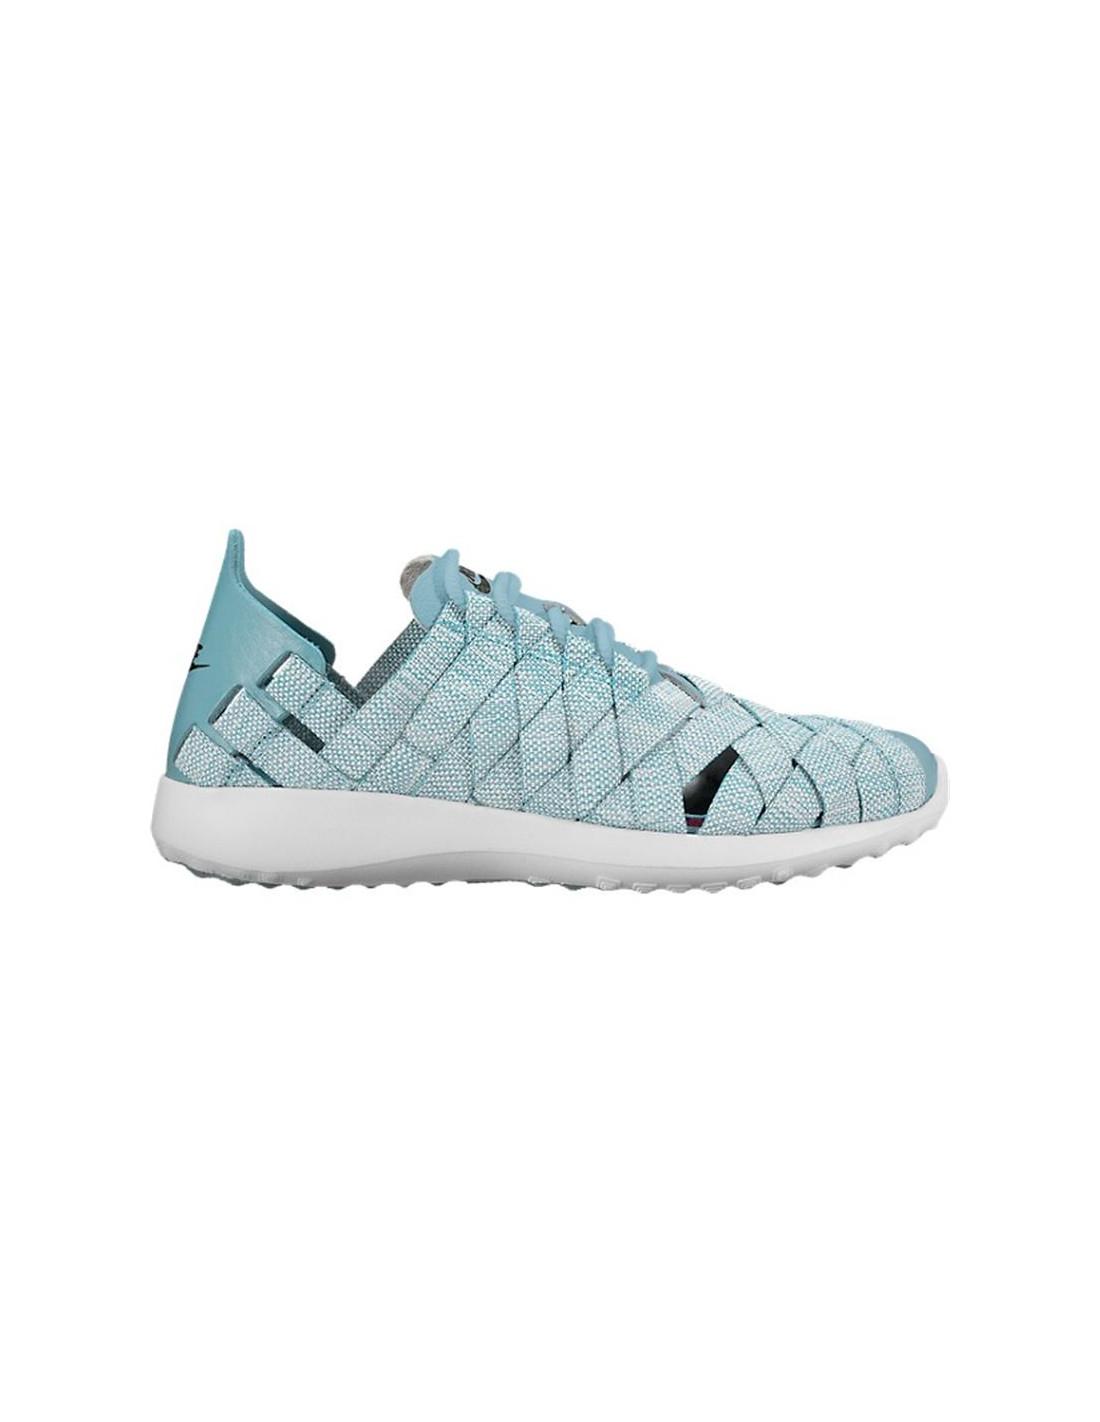 watch 5f050 f13db Zapatillas Nike Juvenate Woven Premium